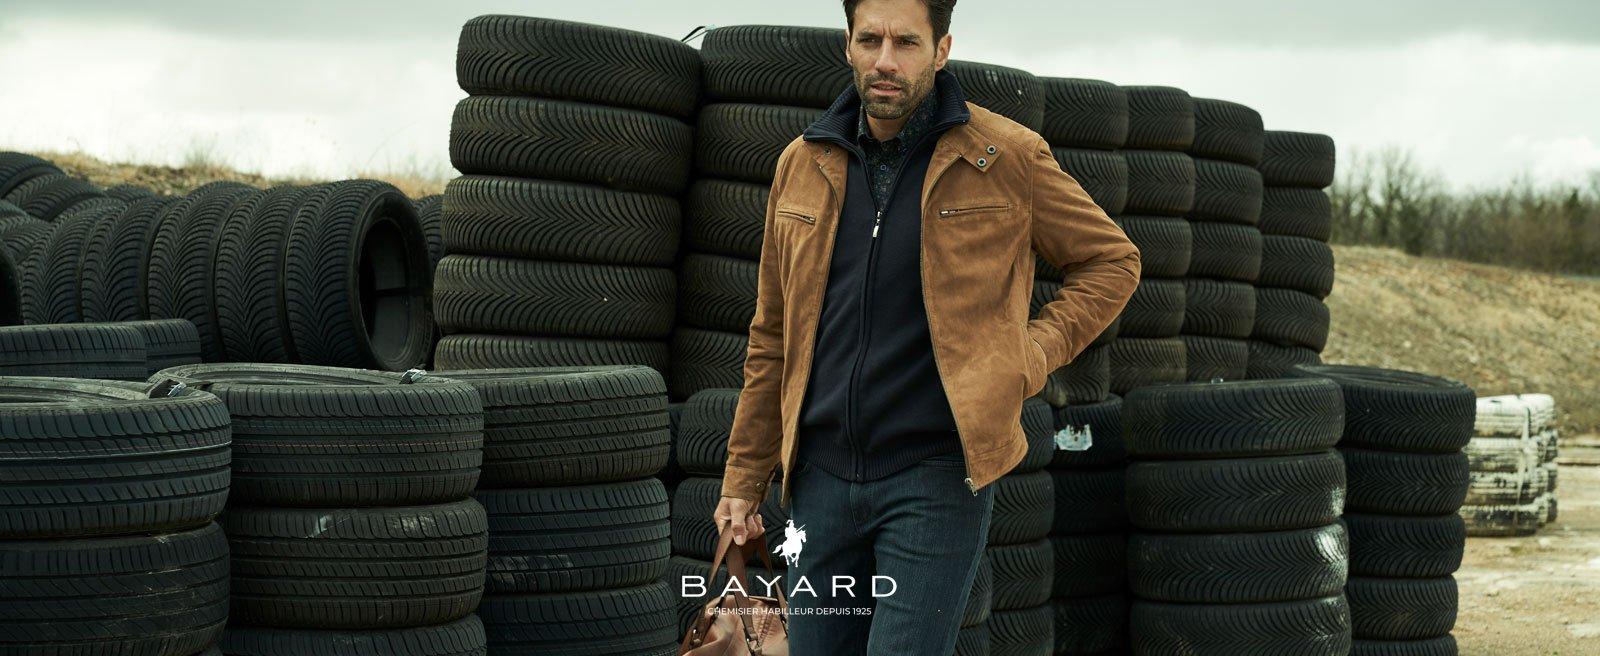 Boutique Bayard - Usine Roubaix